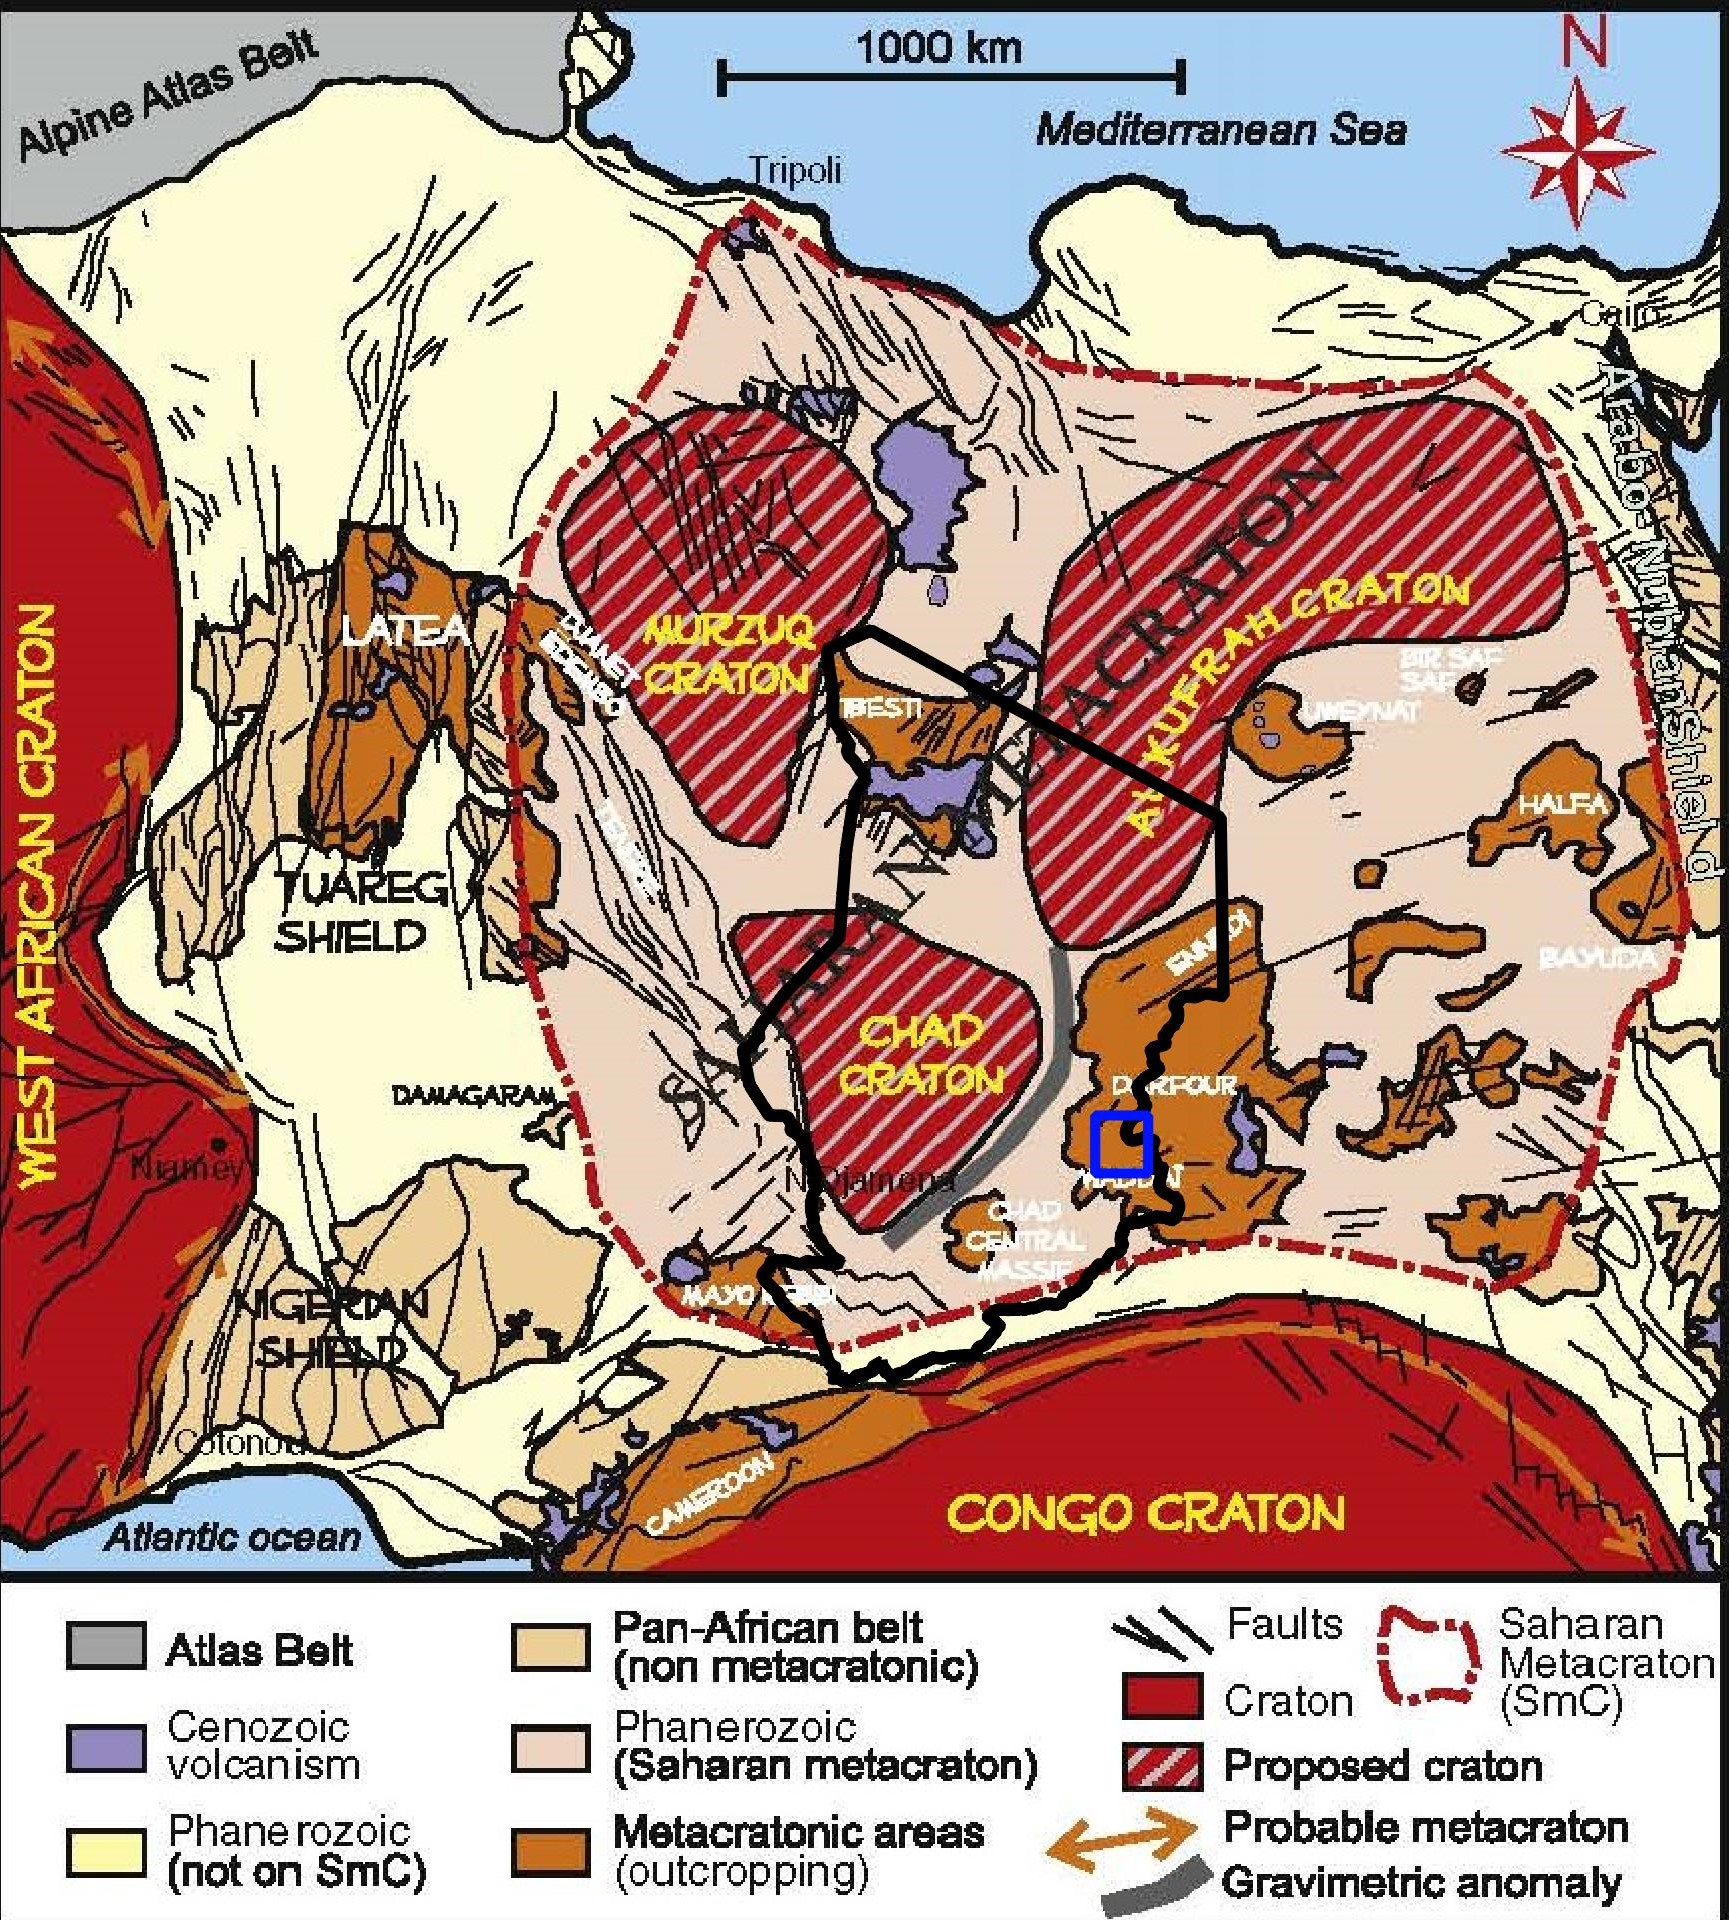 geological settingchad.jpg